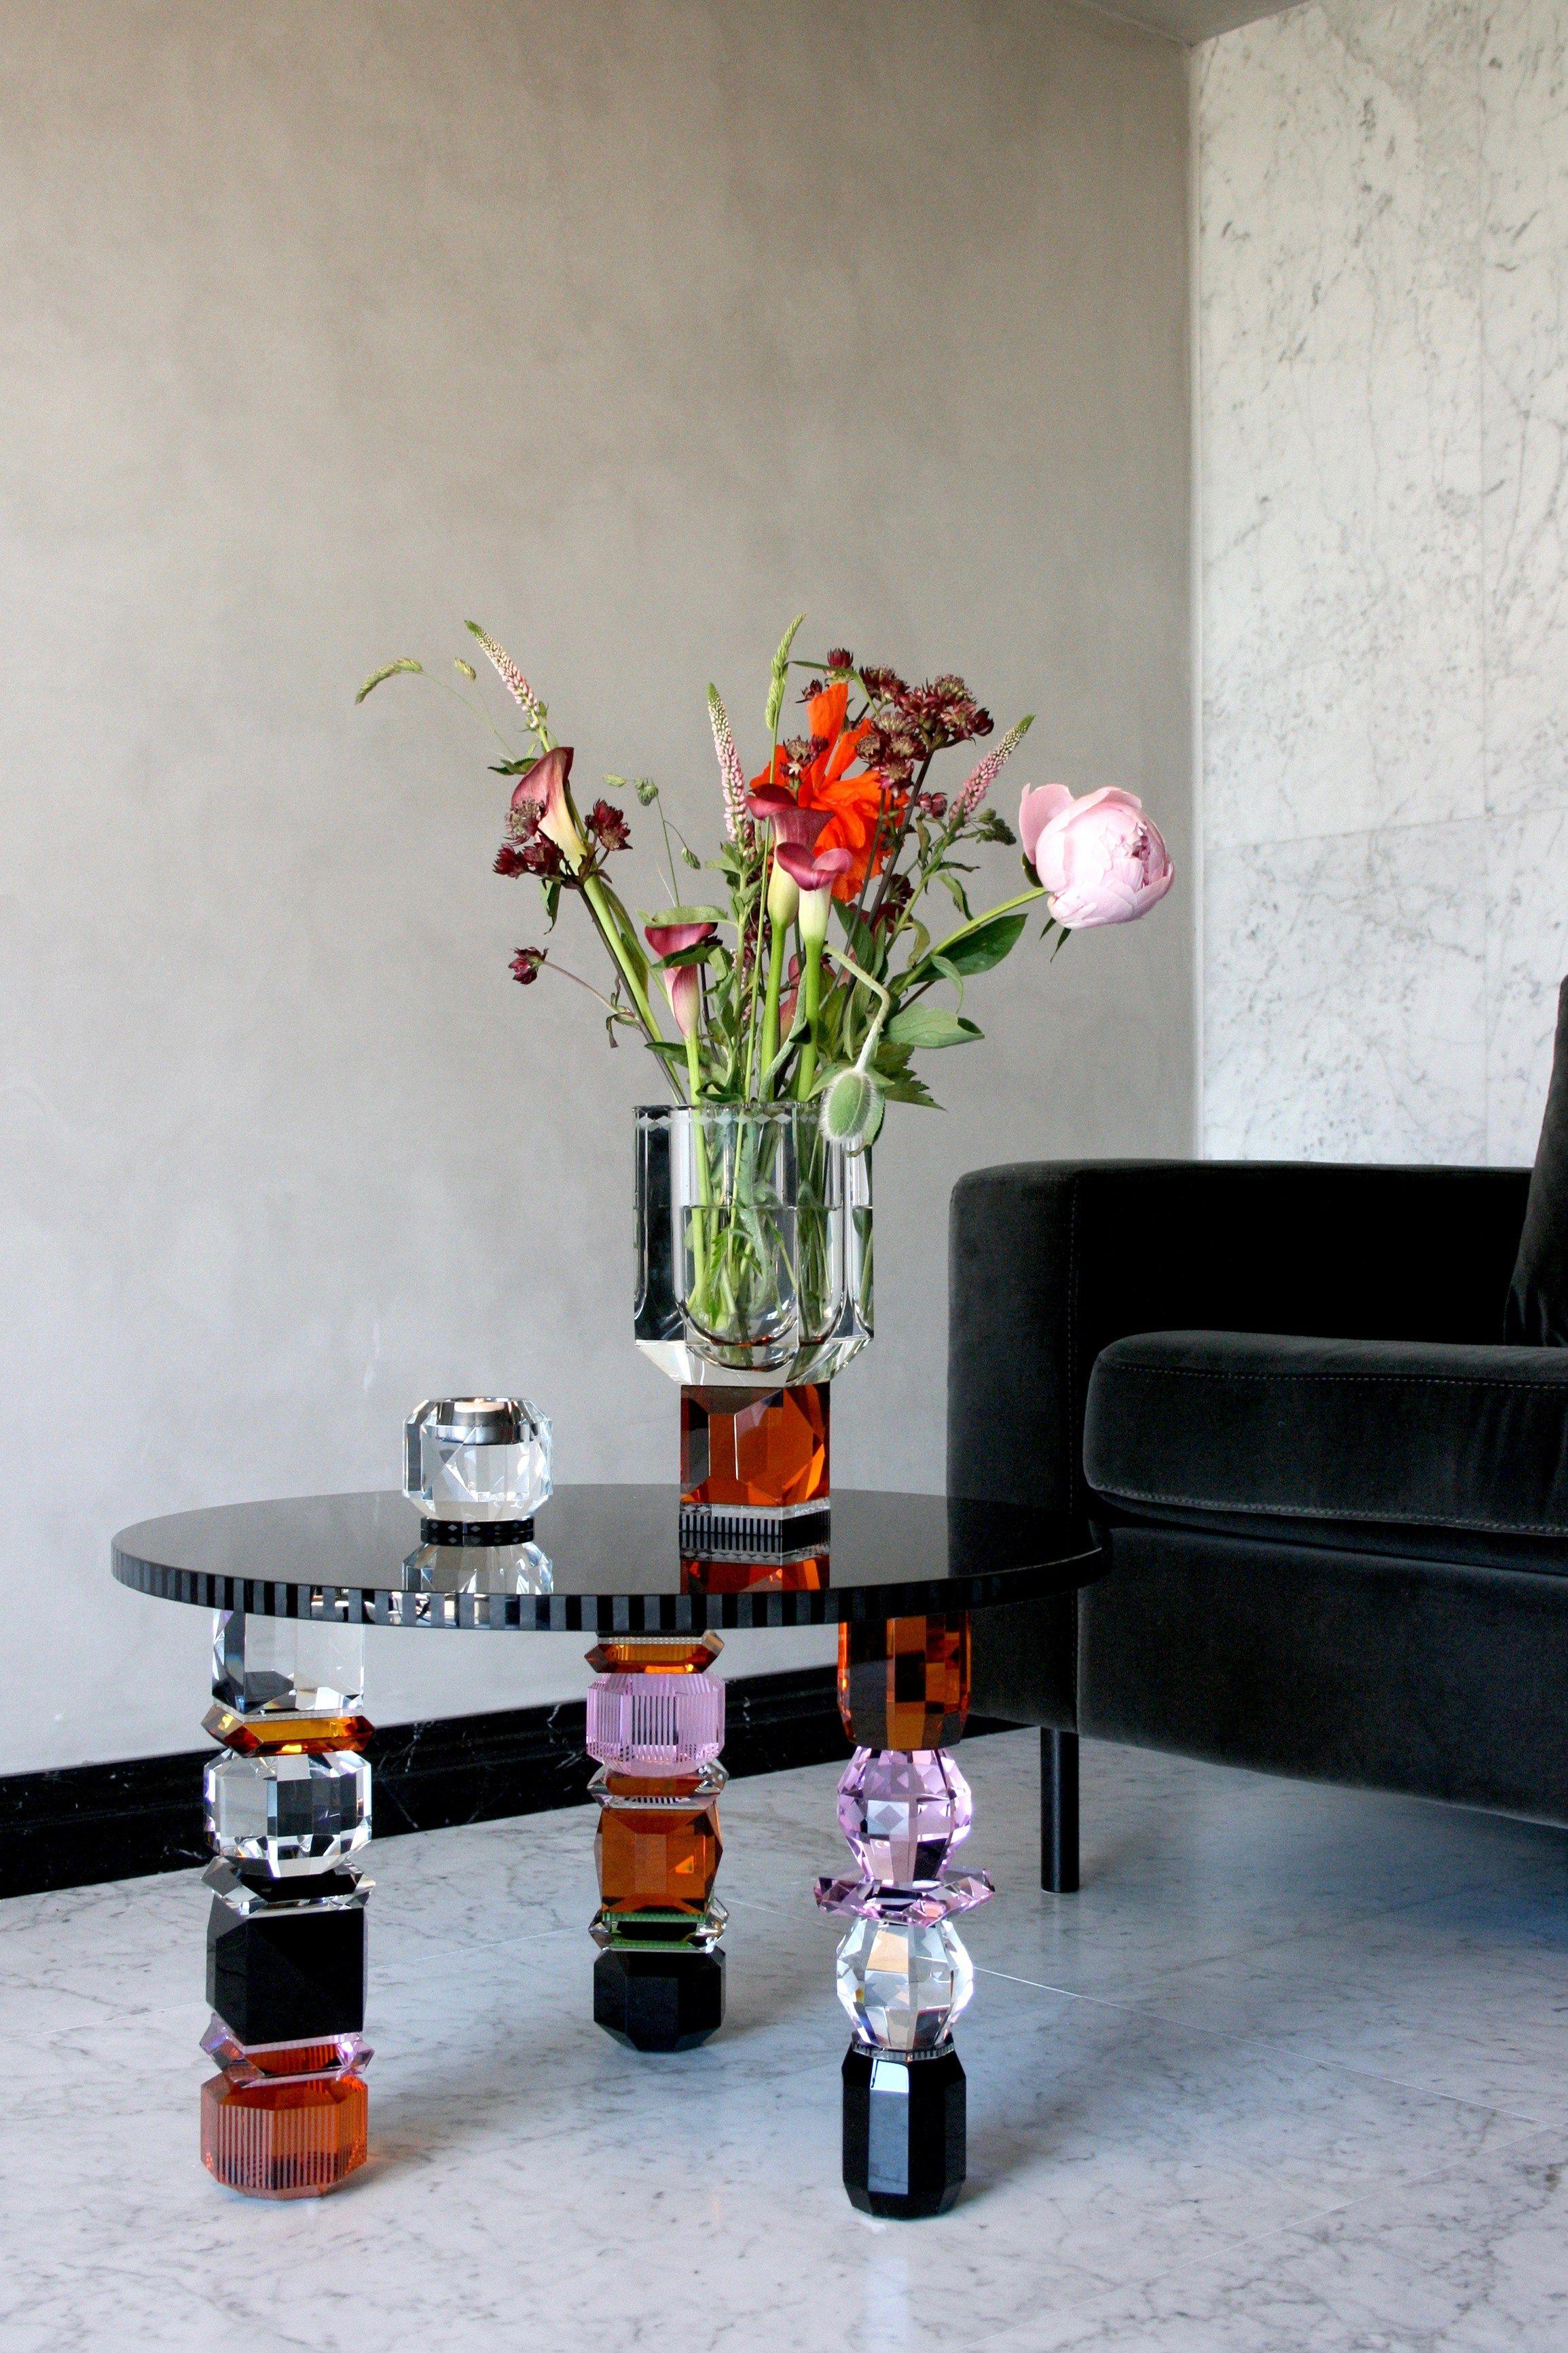 Round Crystal Coffee Table Orlando By Reflections Copenhagen Traditional Mirrors Copenhagen Design Handcrafted Decor [ jpg ]